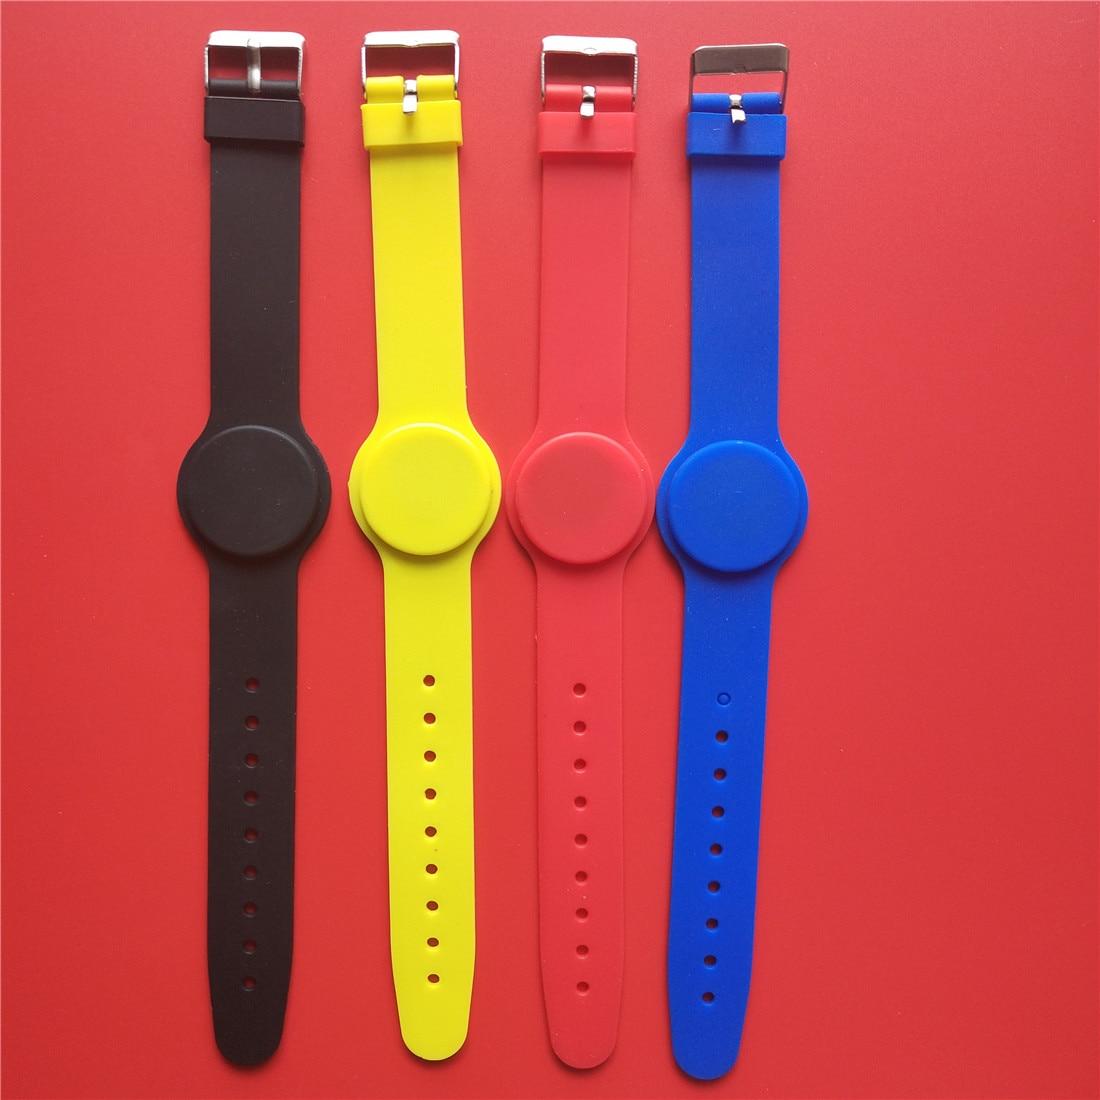 Waterproof 13.56MH RFID Wristband FM1108 IC Silicone Proximity Smart Bracelet - 10pcs